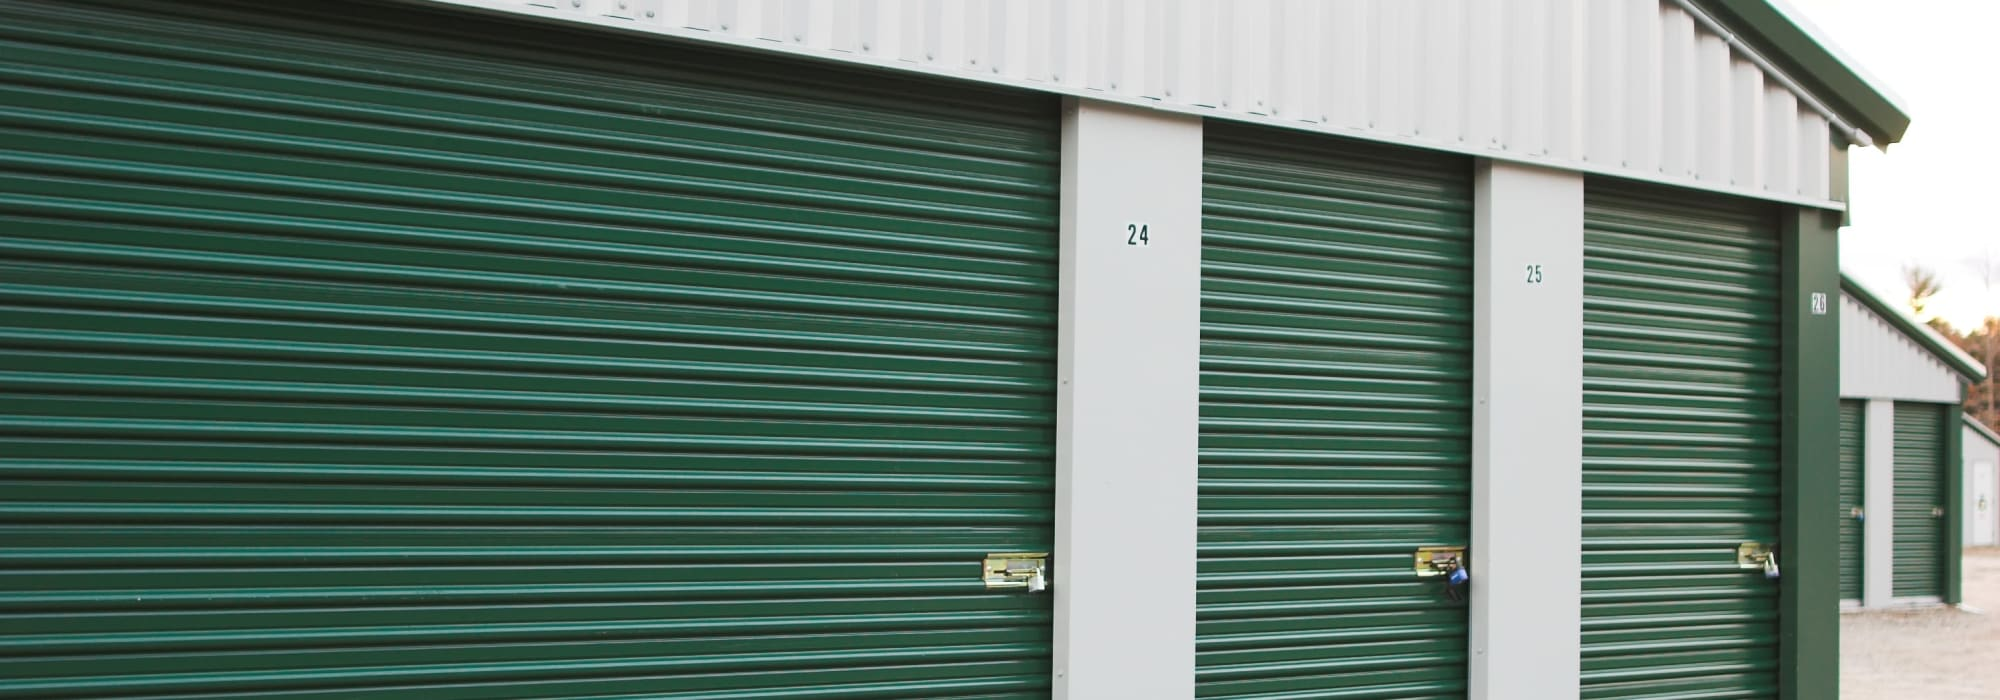 603 Storage self storage in Pittsfield, New Hampshire